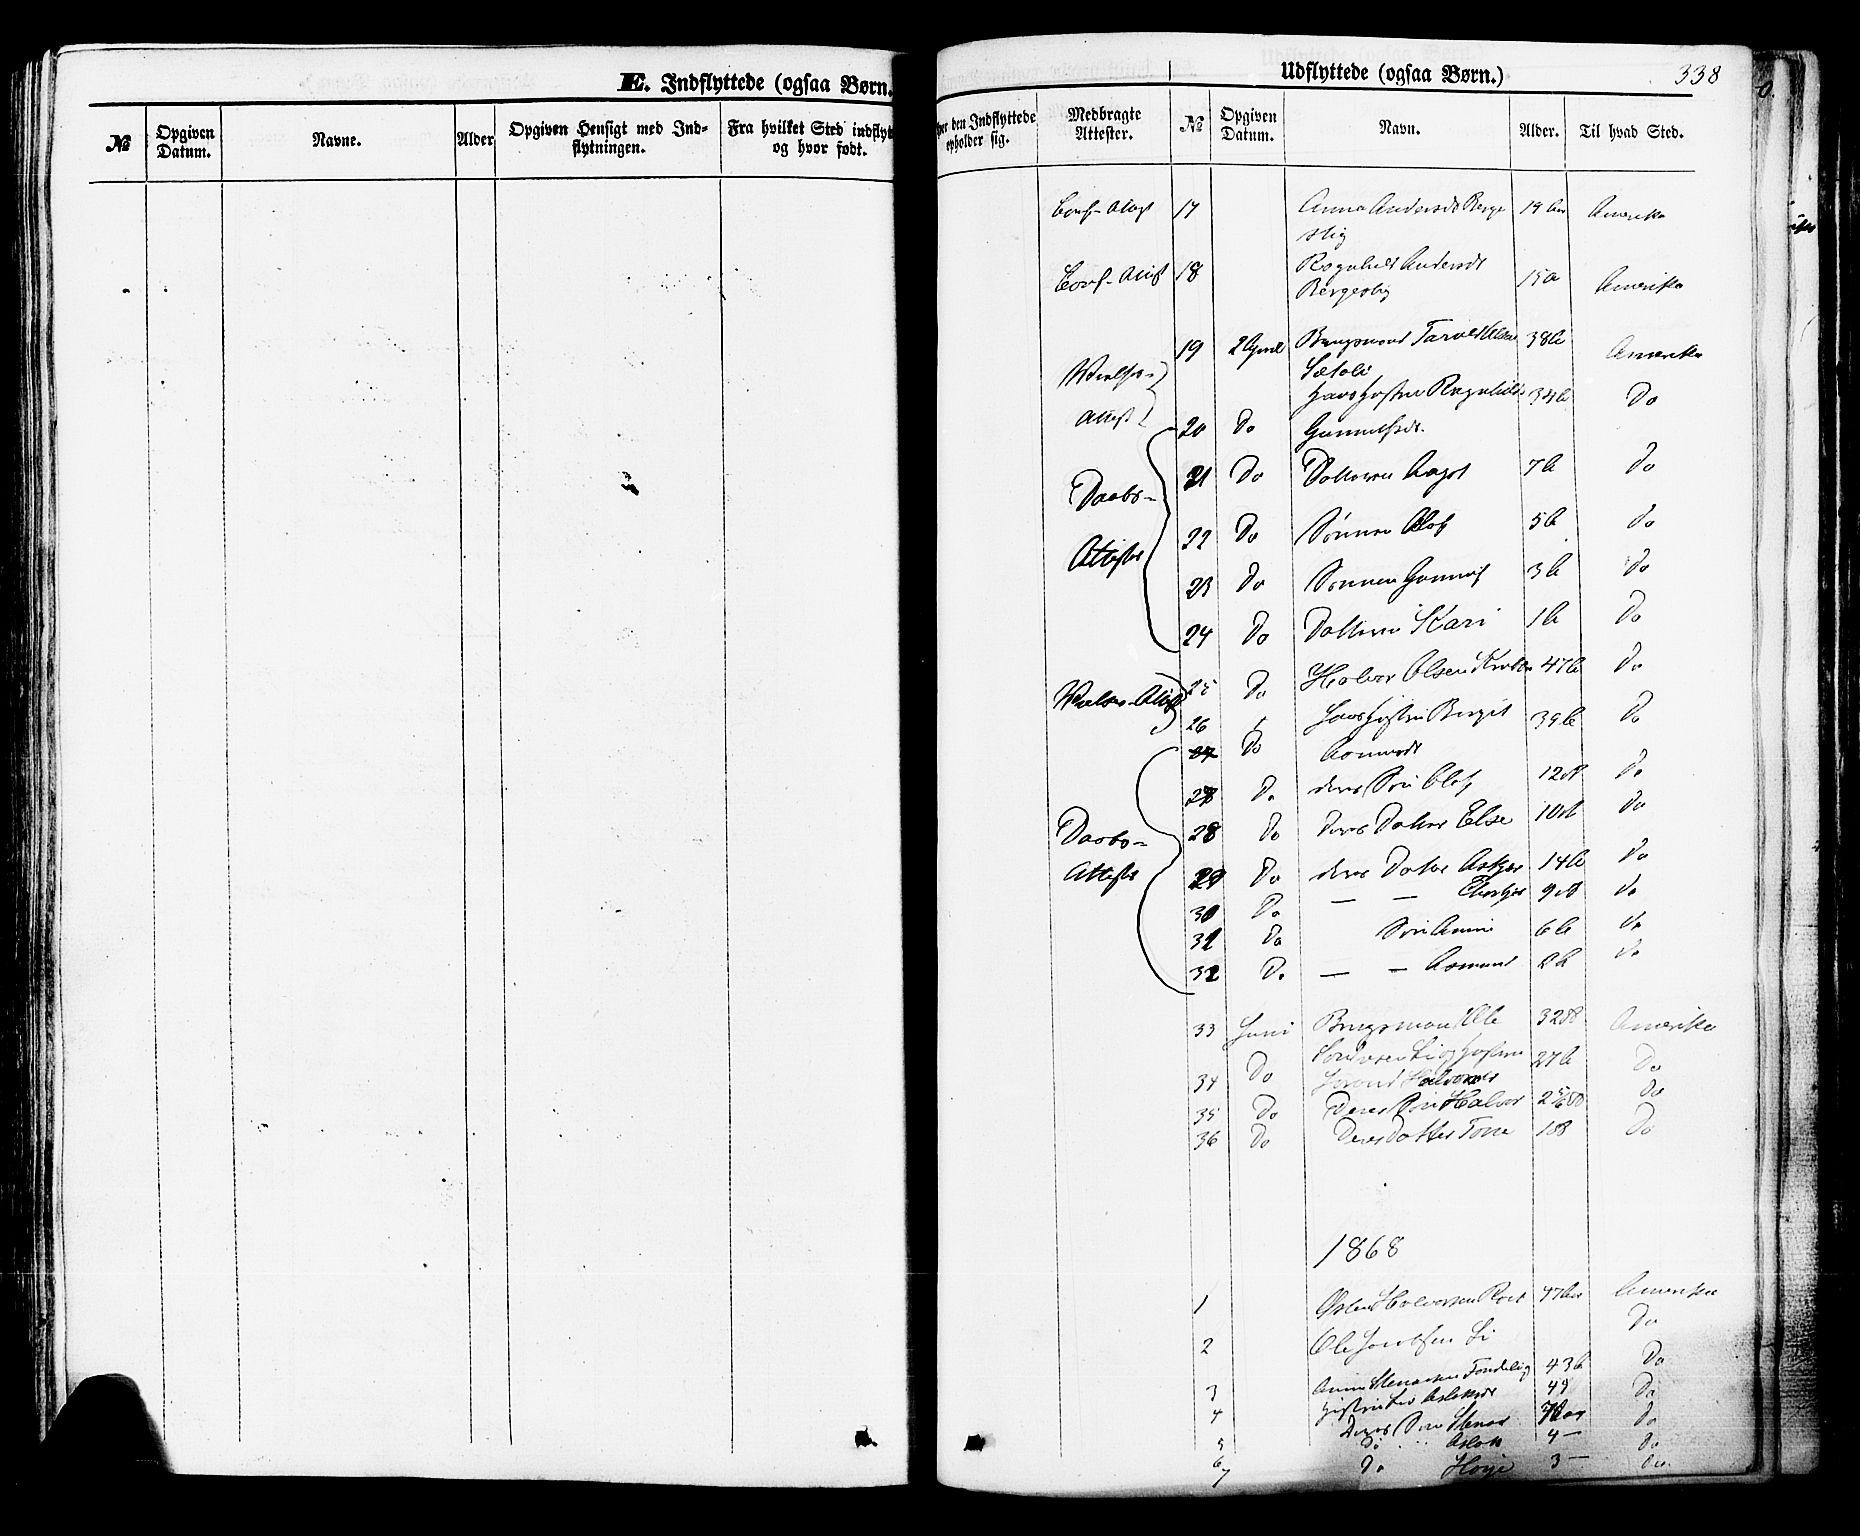 SAKO, Rauland kirkebøker, F/Fa/L0003: Ministerialbok nr. 3, 1859-1886, s. 338